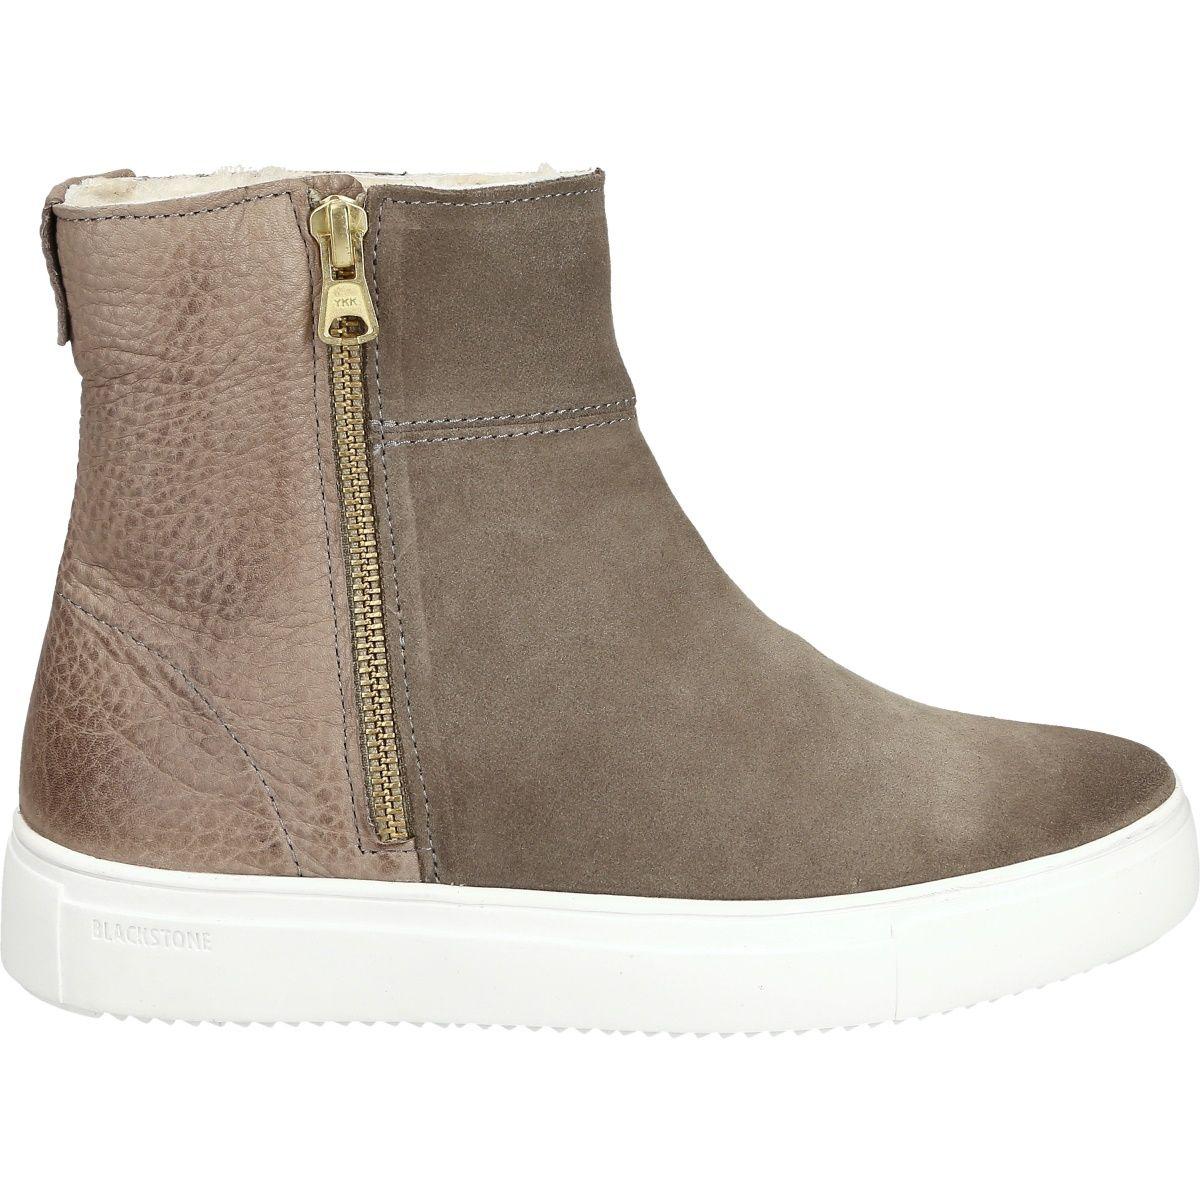 Blackstone QL49 ICELAND Damenschuhe Stiefeletten im Schuhe